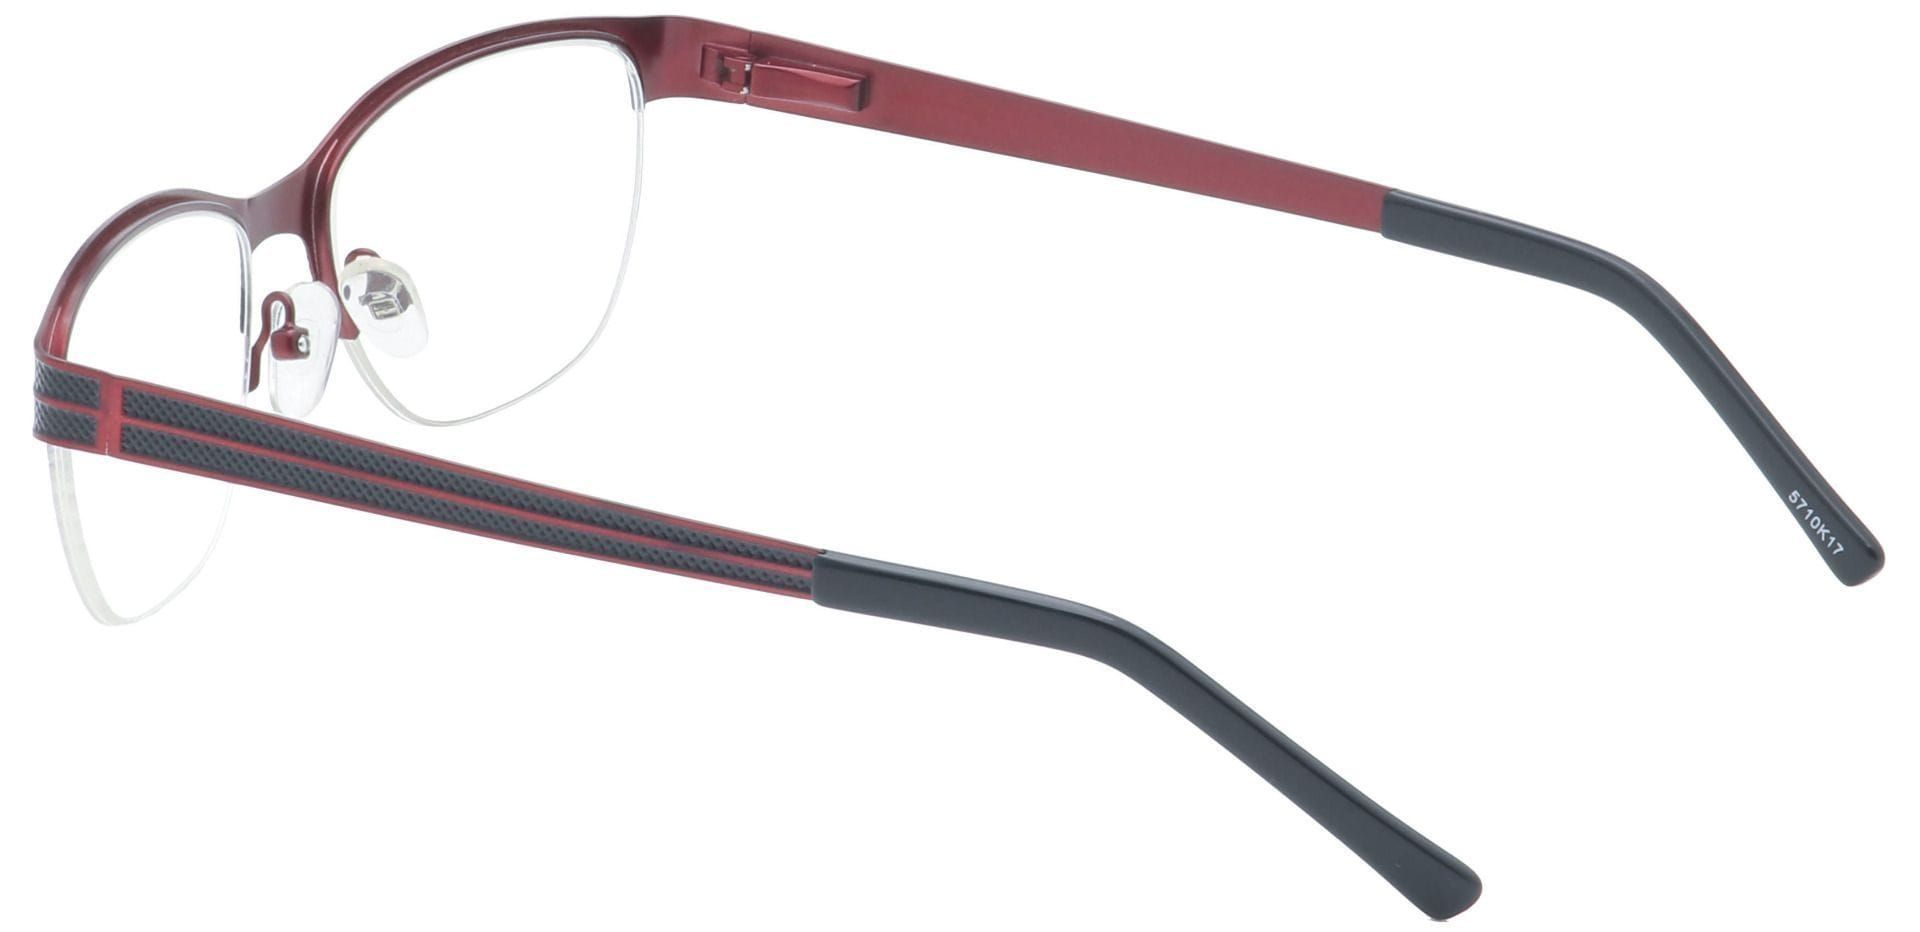 Arren Round Blue Light Blocking Glasses - Red